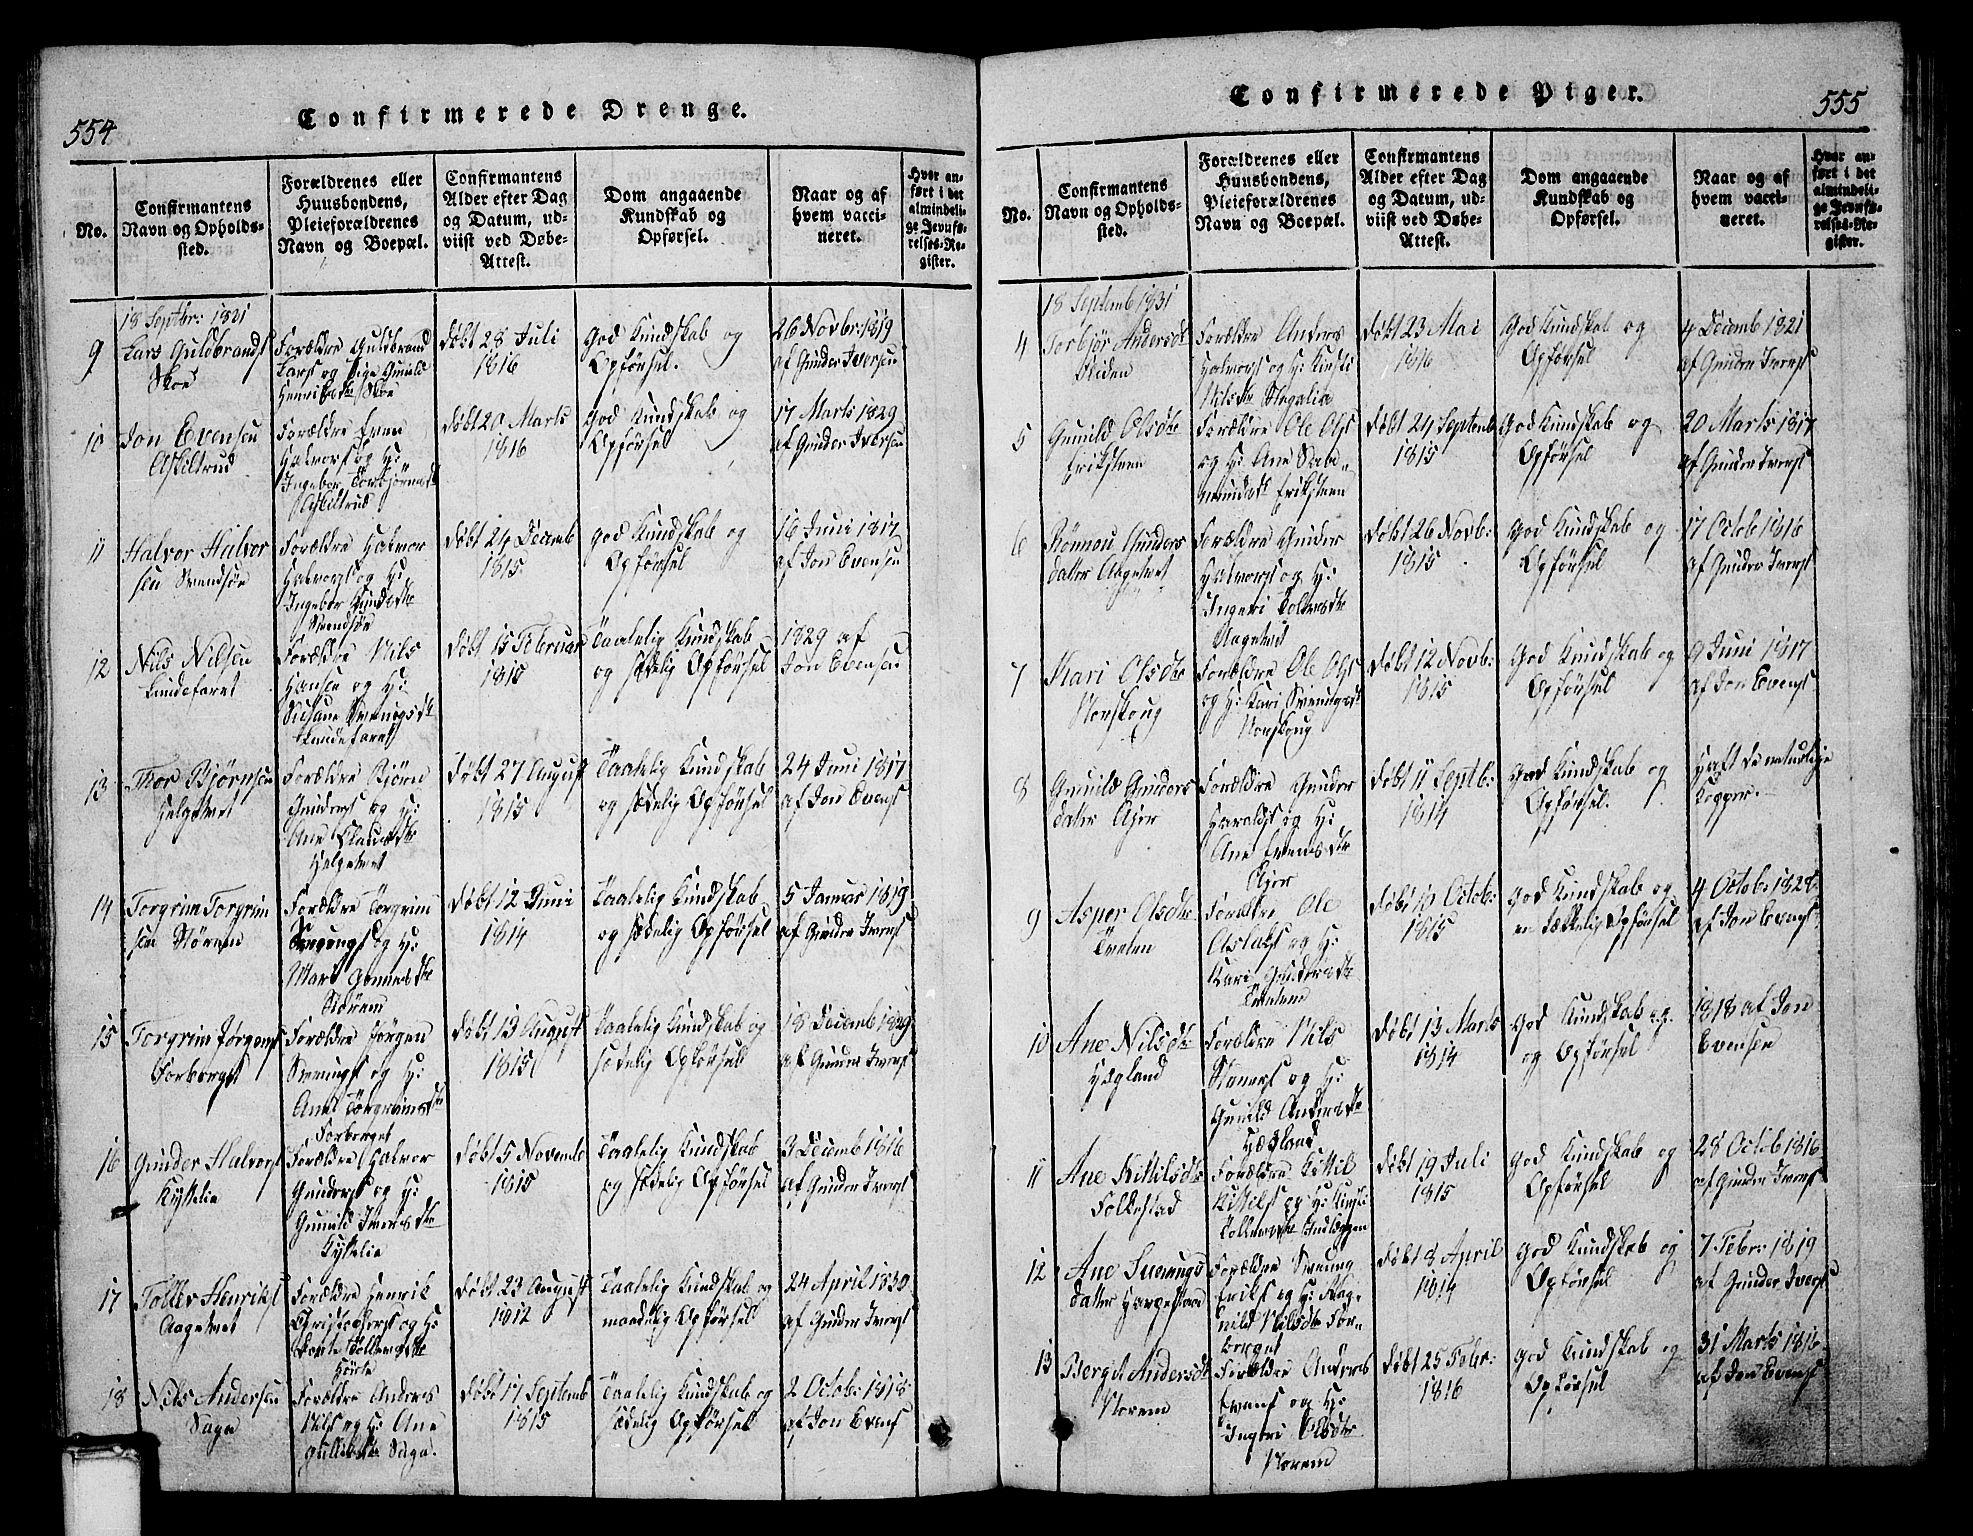 SAKO, Bø kirkebøker, G/Ga/L0001: Klokkerbok nr. 1, 1815-1831, s. 554-555